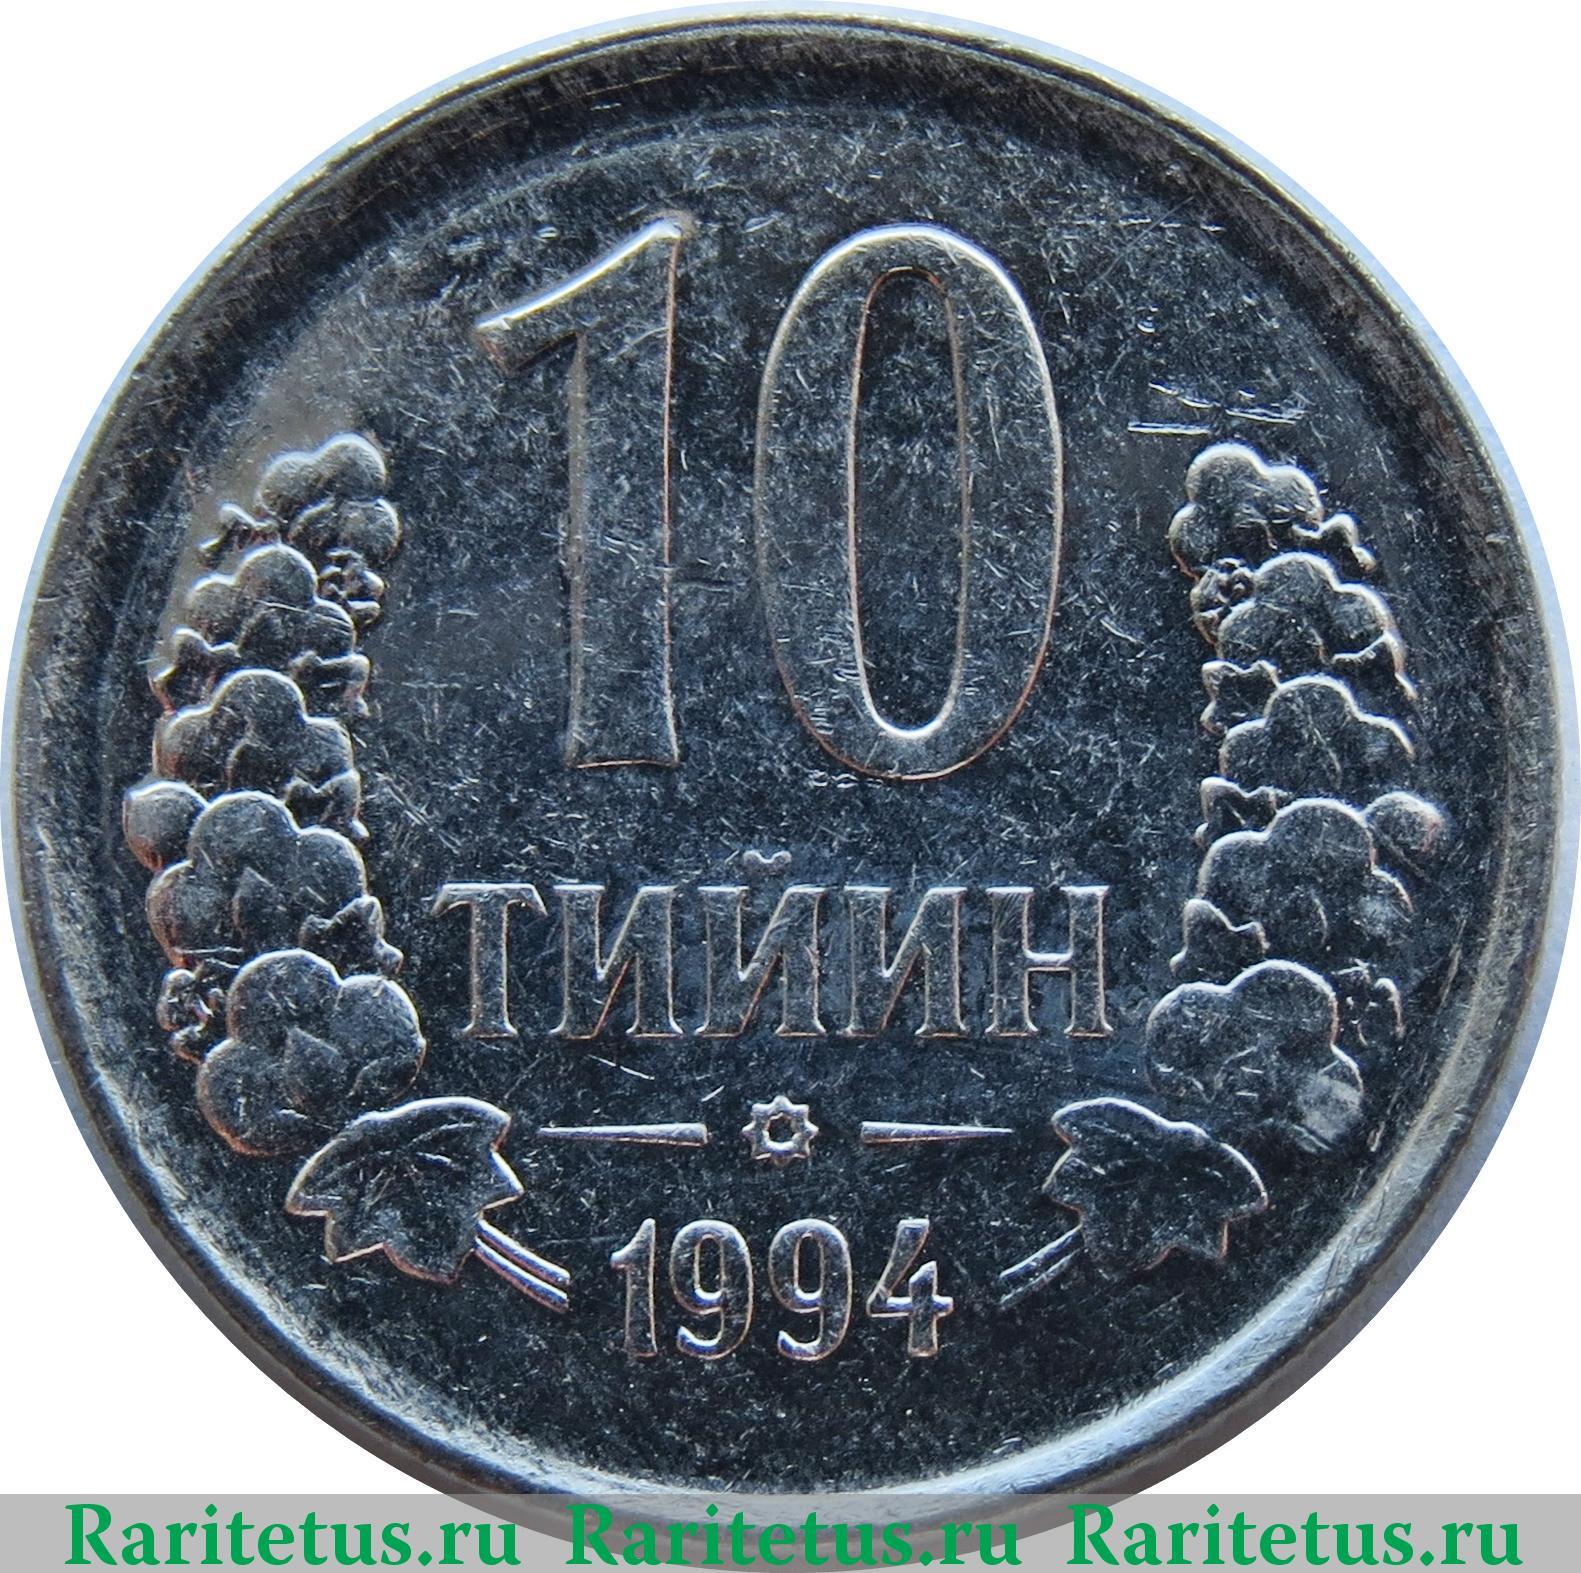 Сколько стоит манета 20 тийин с точками на реверсе 5 рупий